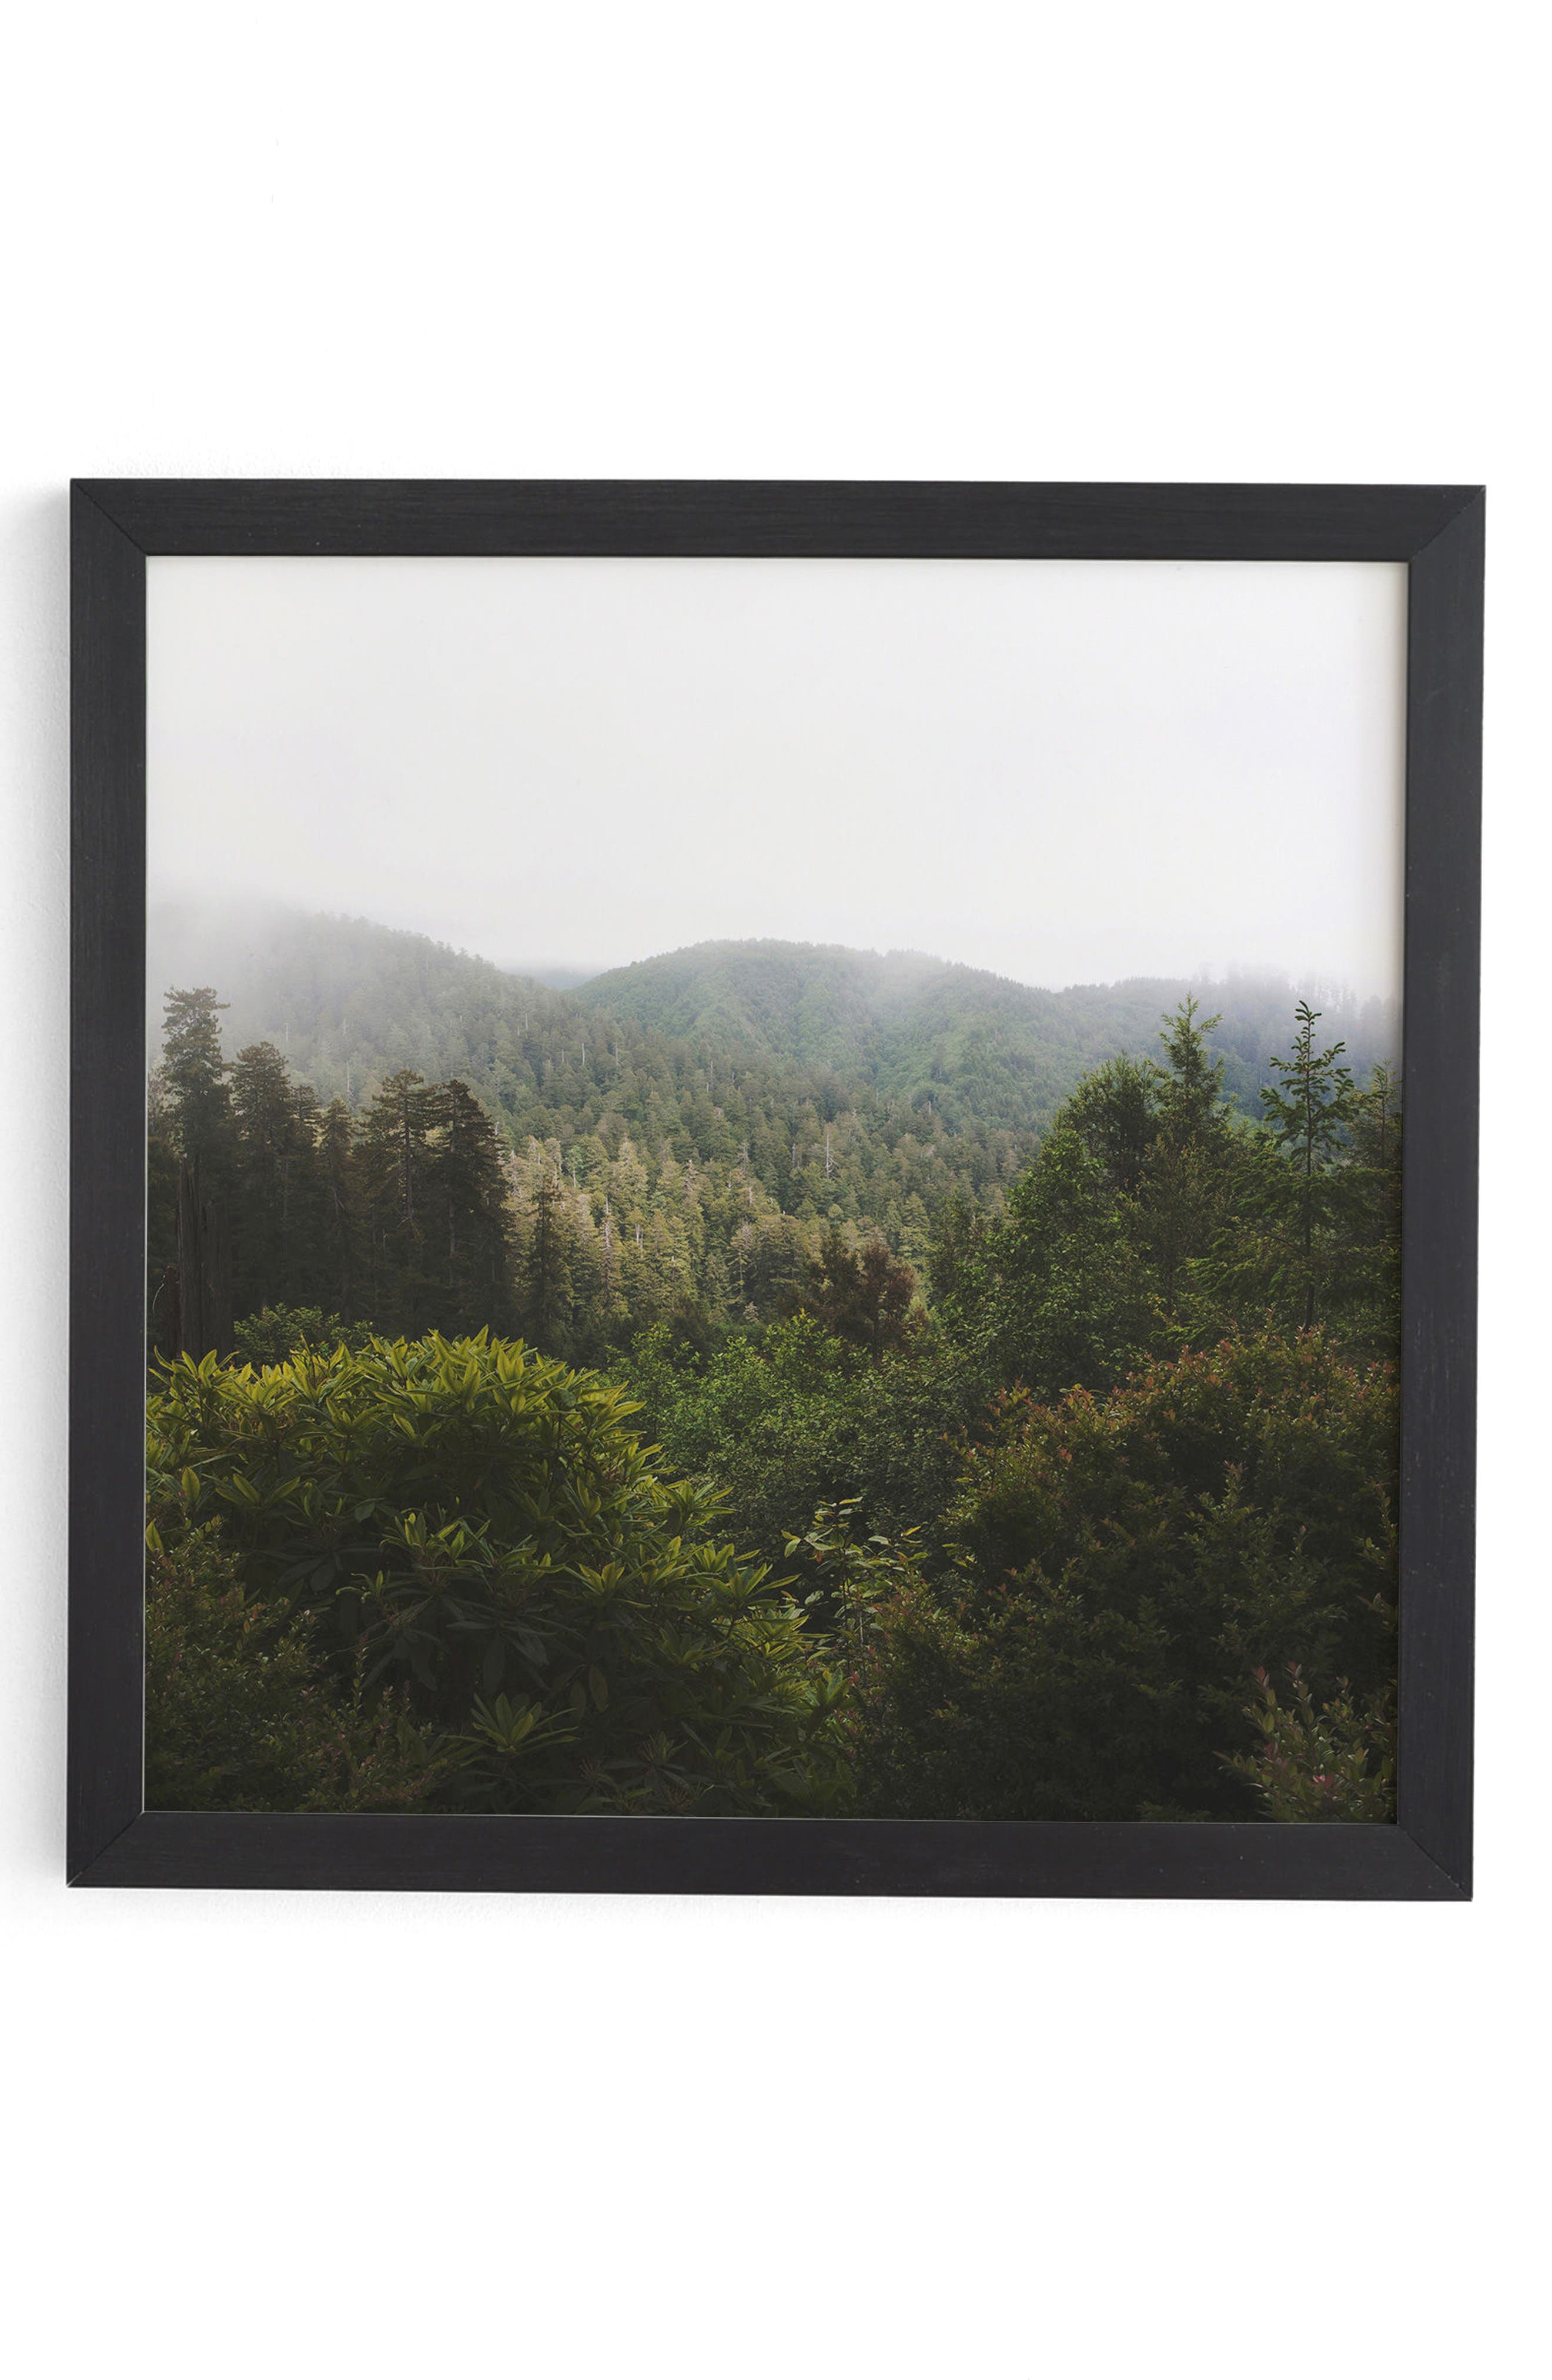 Main Image - Deny Designs Redwood Forest Framed Wall Art